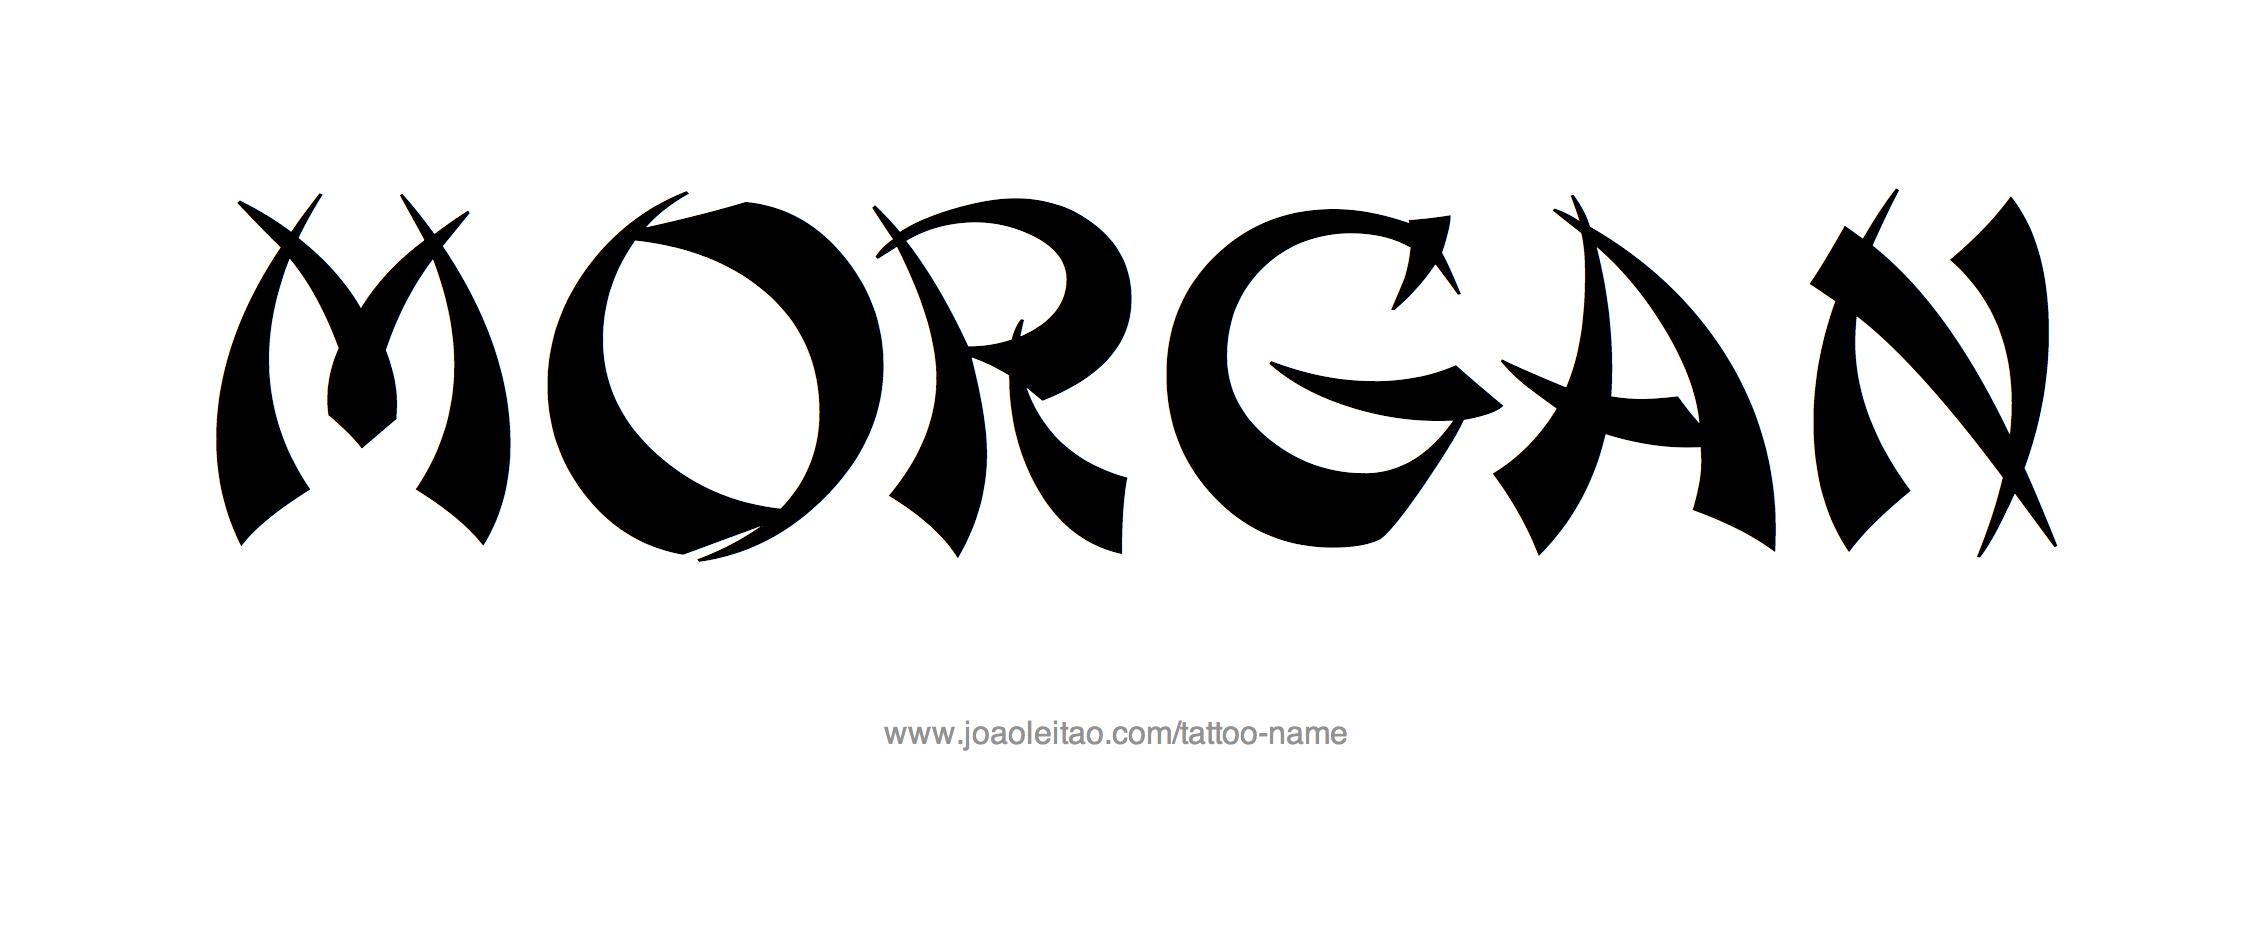 morgan name tattoo designs